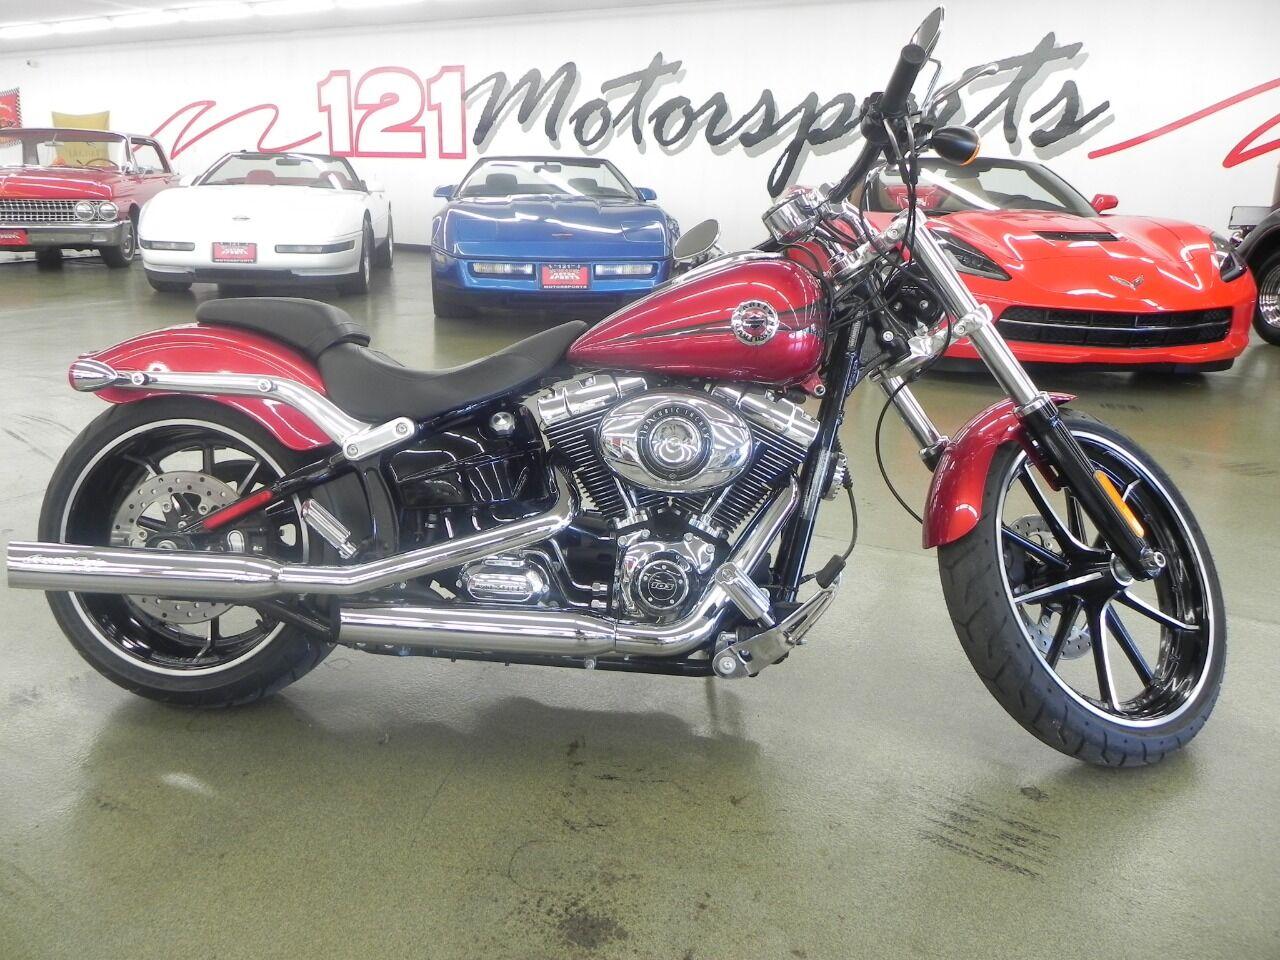 The 2013 Harley-Davidson Breakout  photos